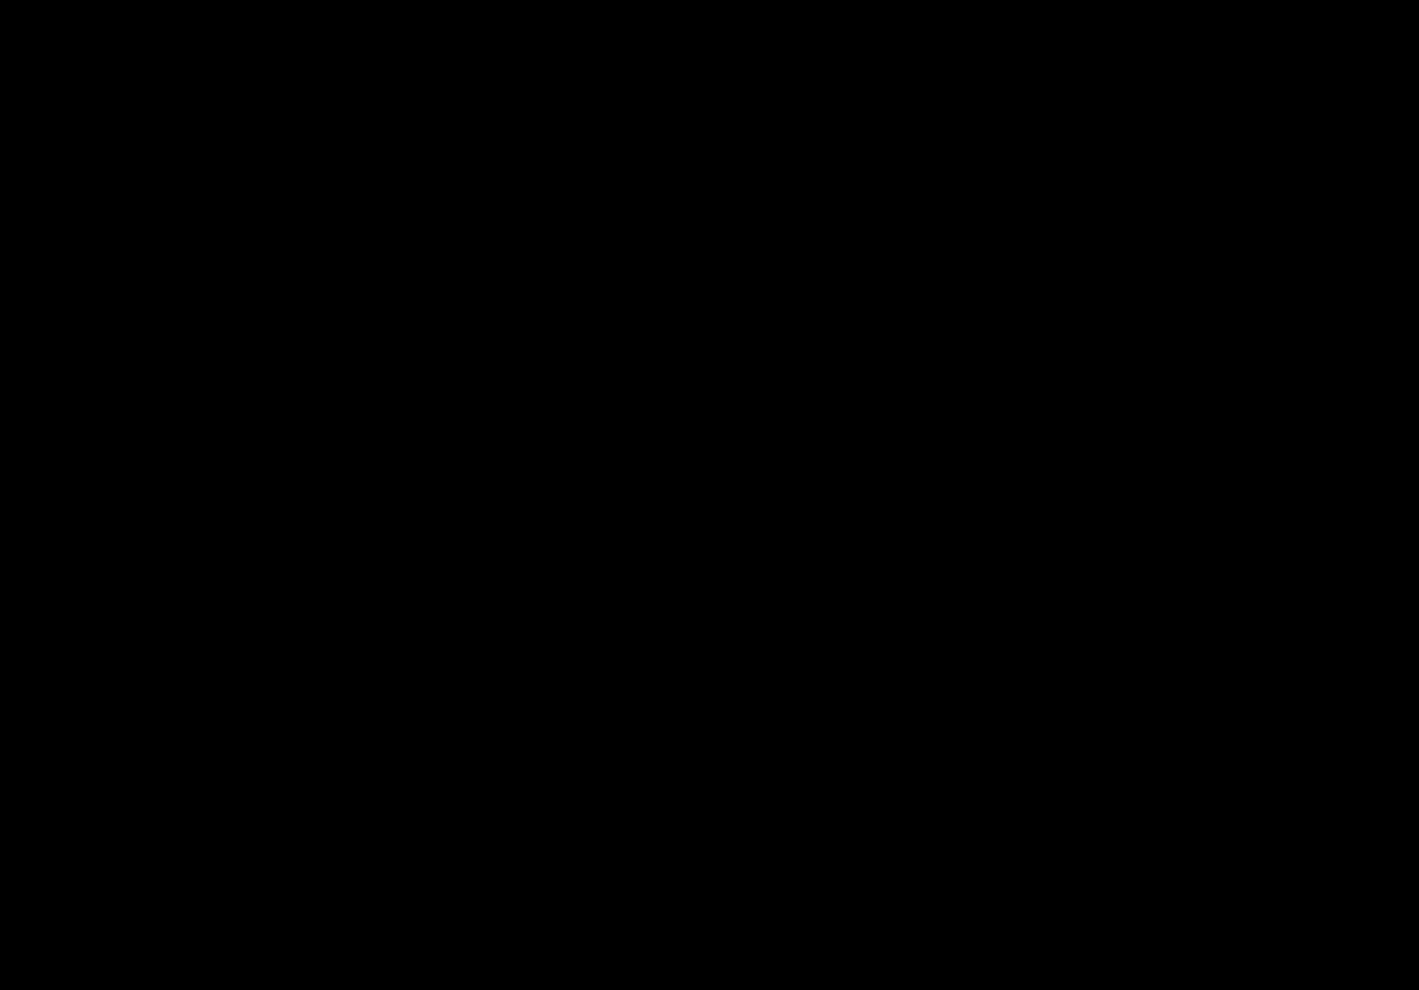 Cefepime DiHCl Monohydrate